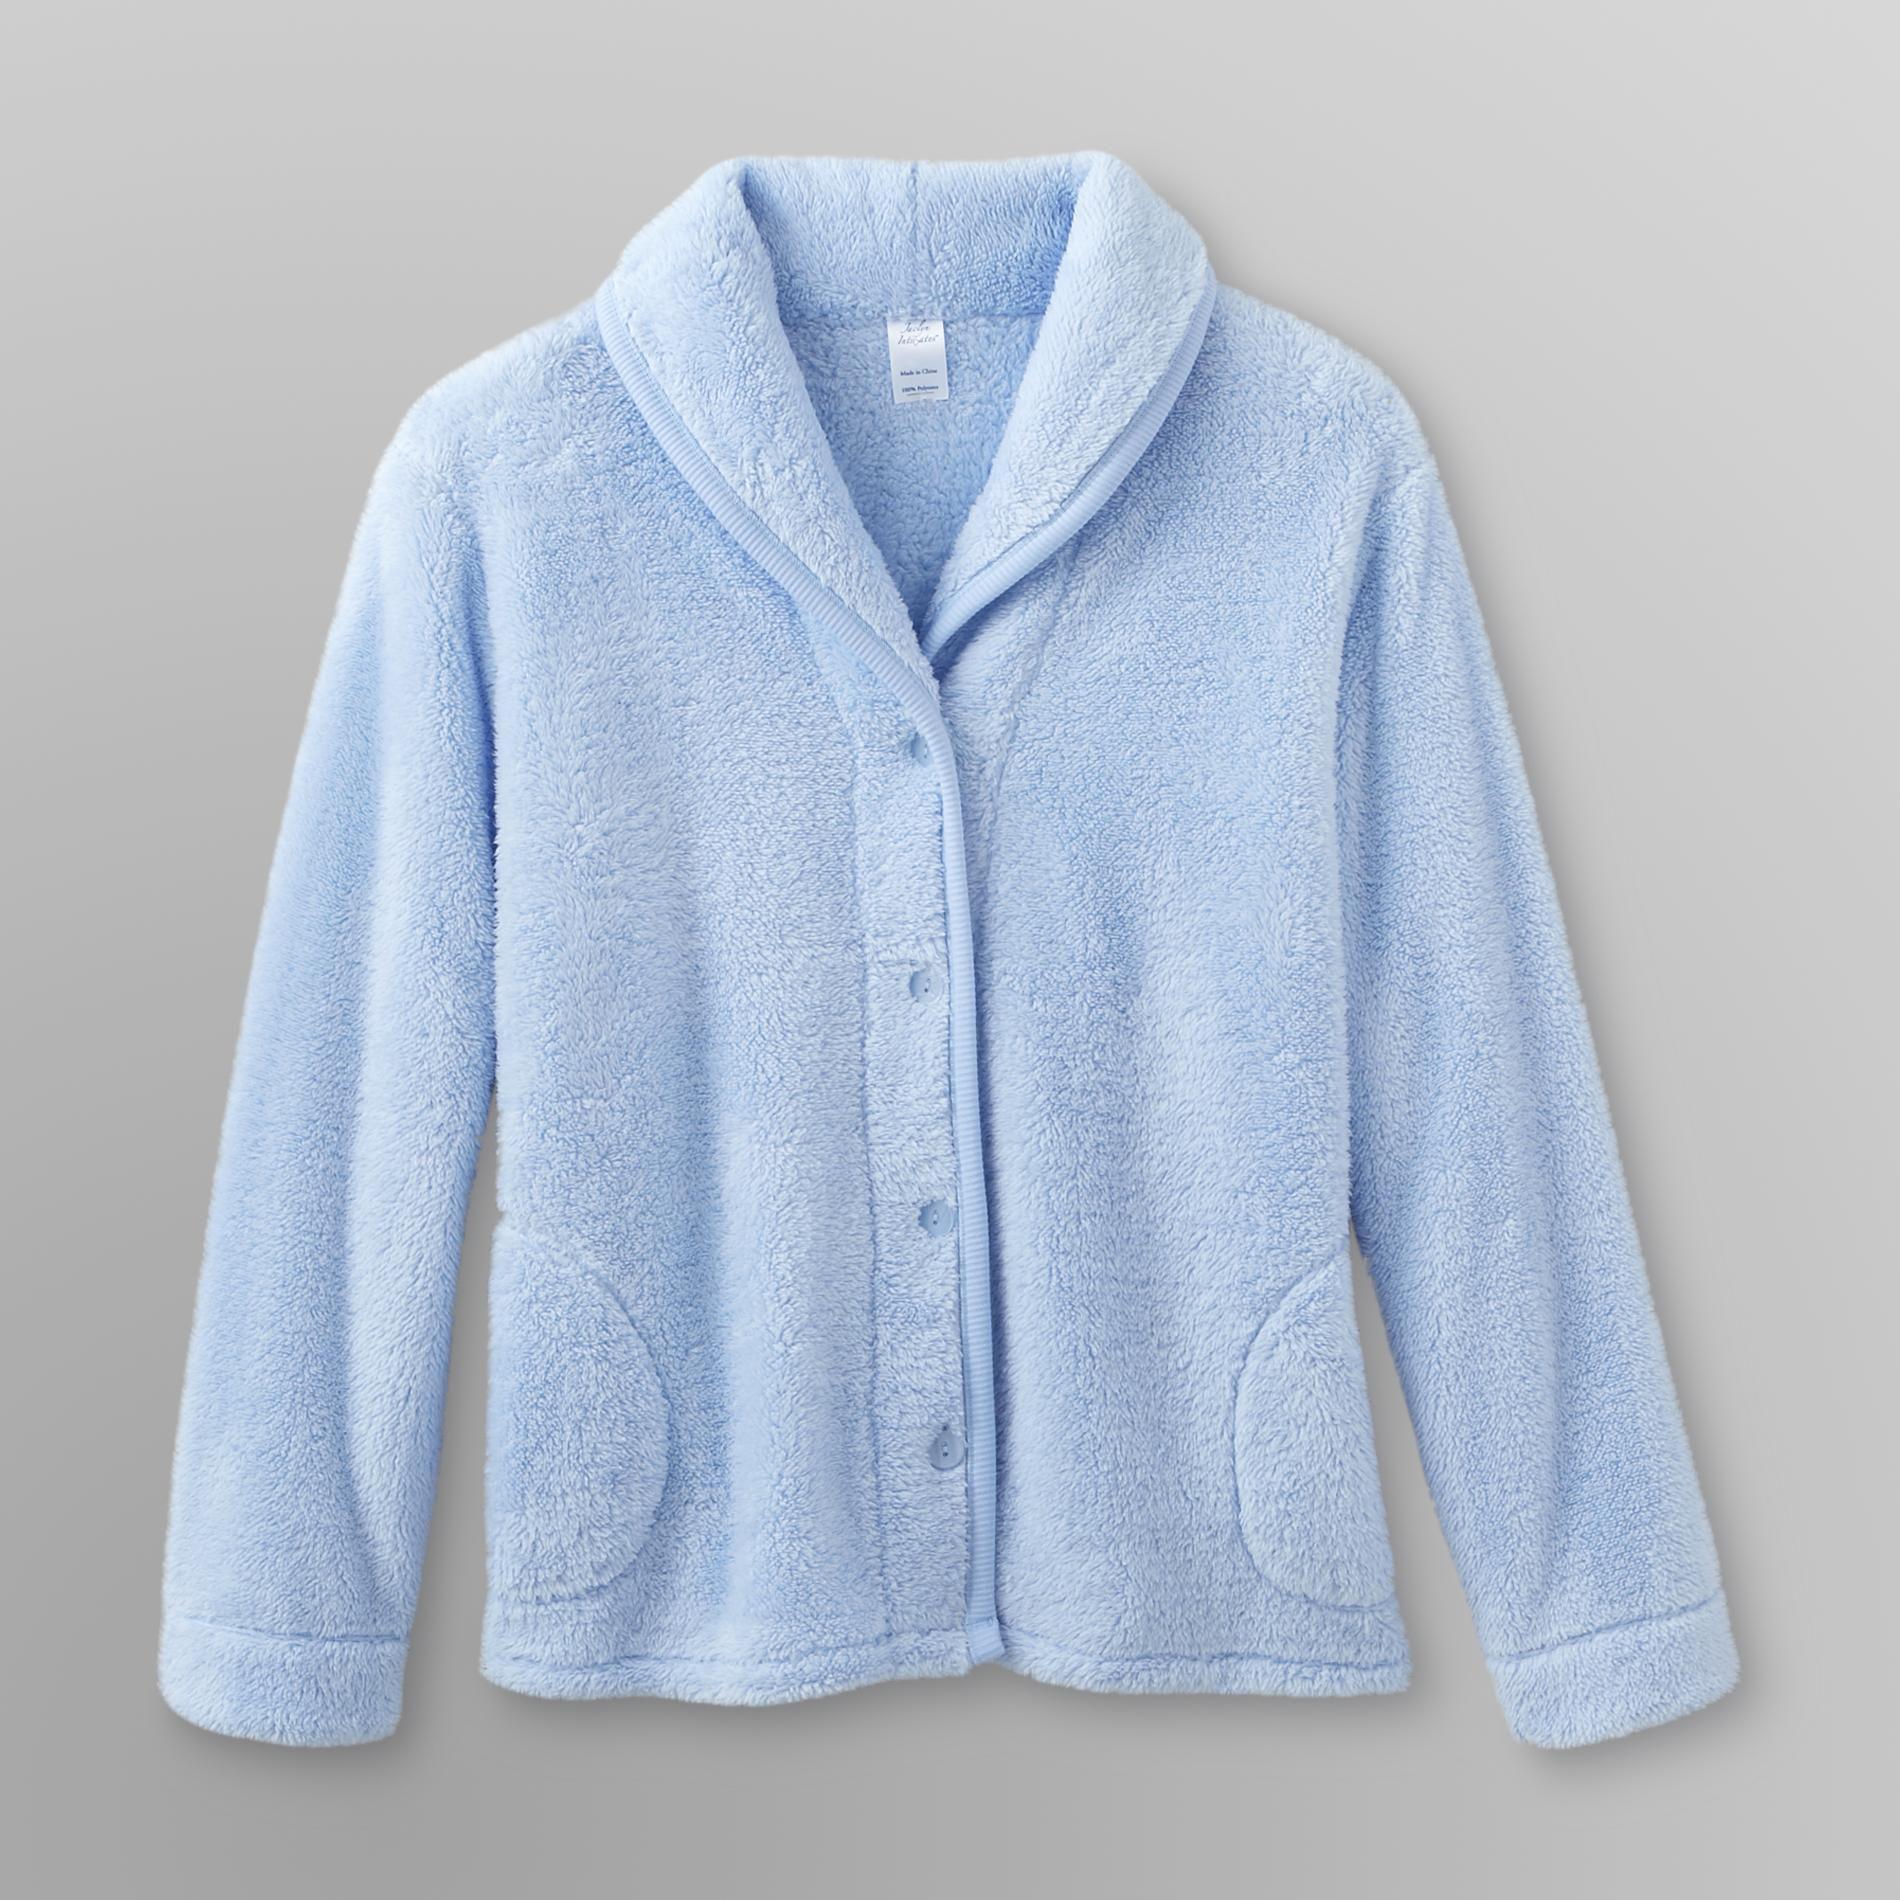 Jaclyn Intimates Womens Plush Bed Jacket